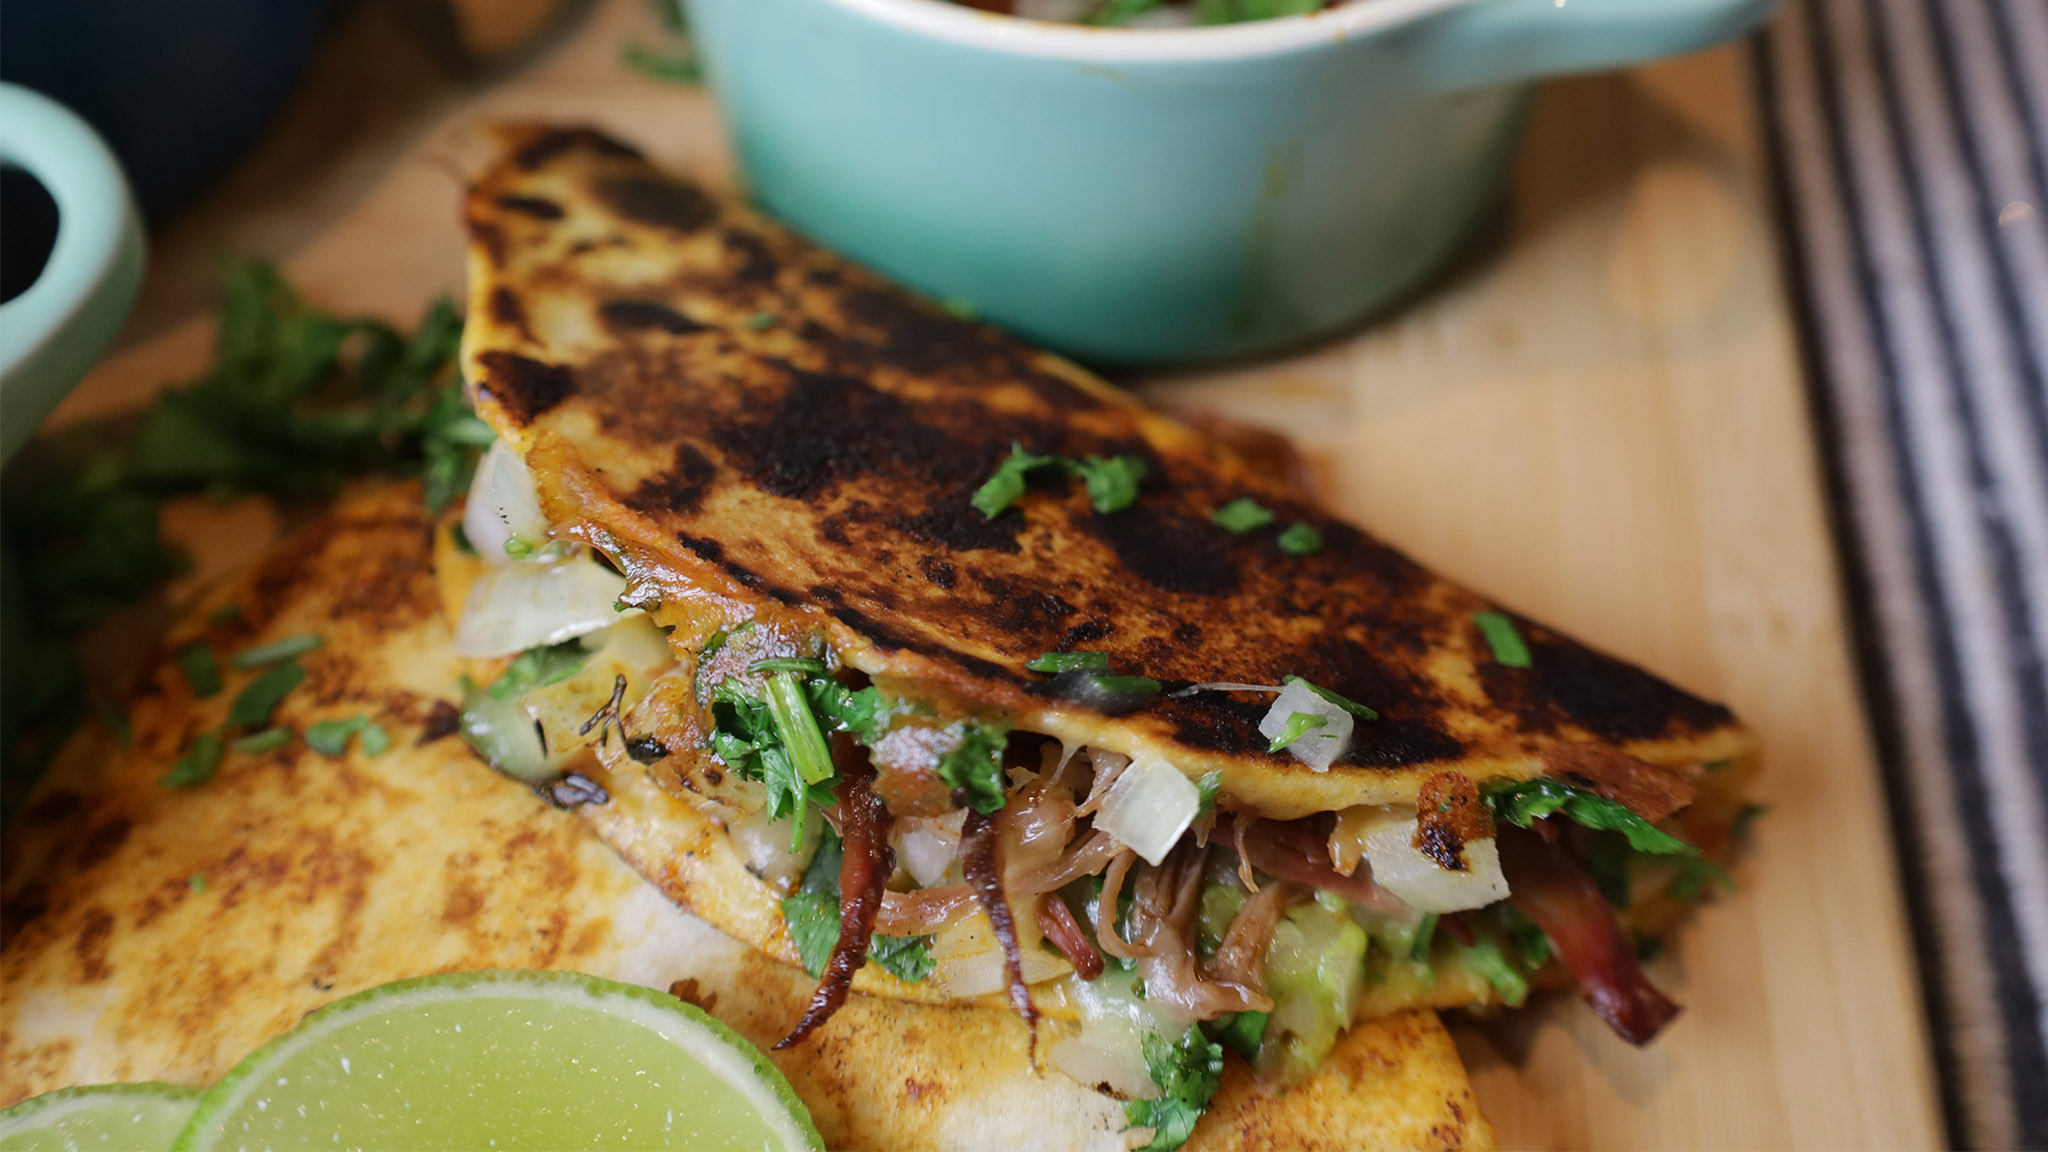 birria tacos on a wooden board